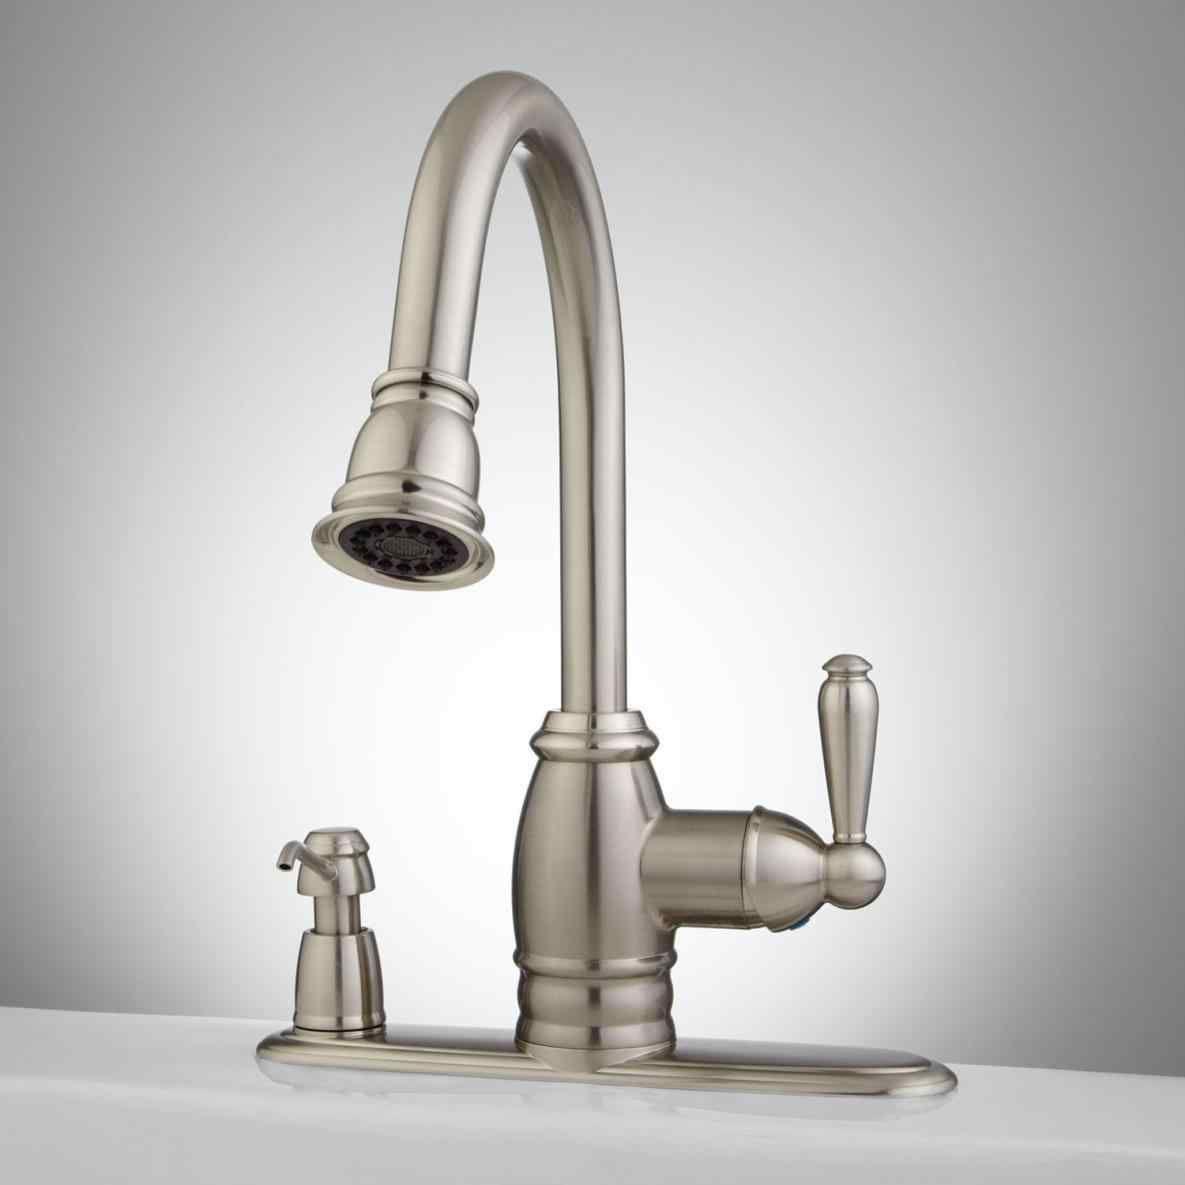 Best Cheap Kitchen Faucet | Cheap kitchen faucets, Cheap kitchen and ...